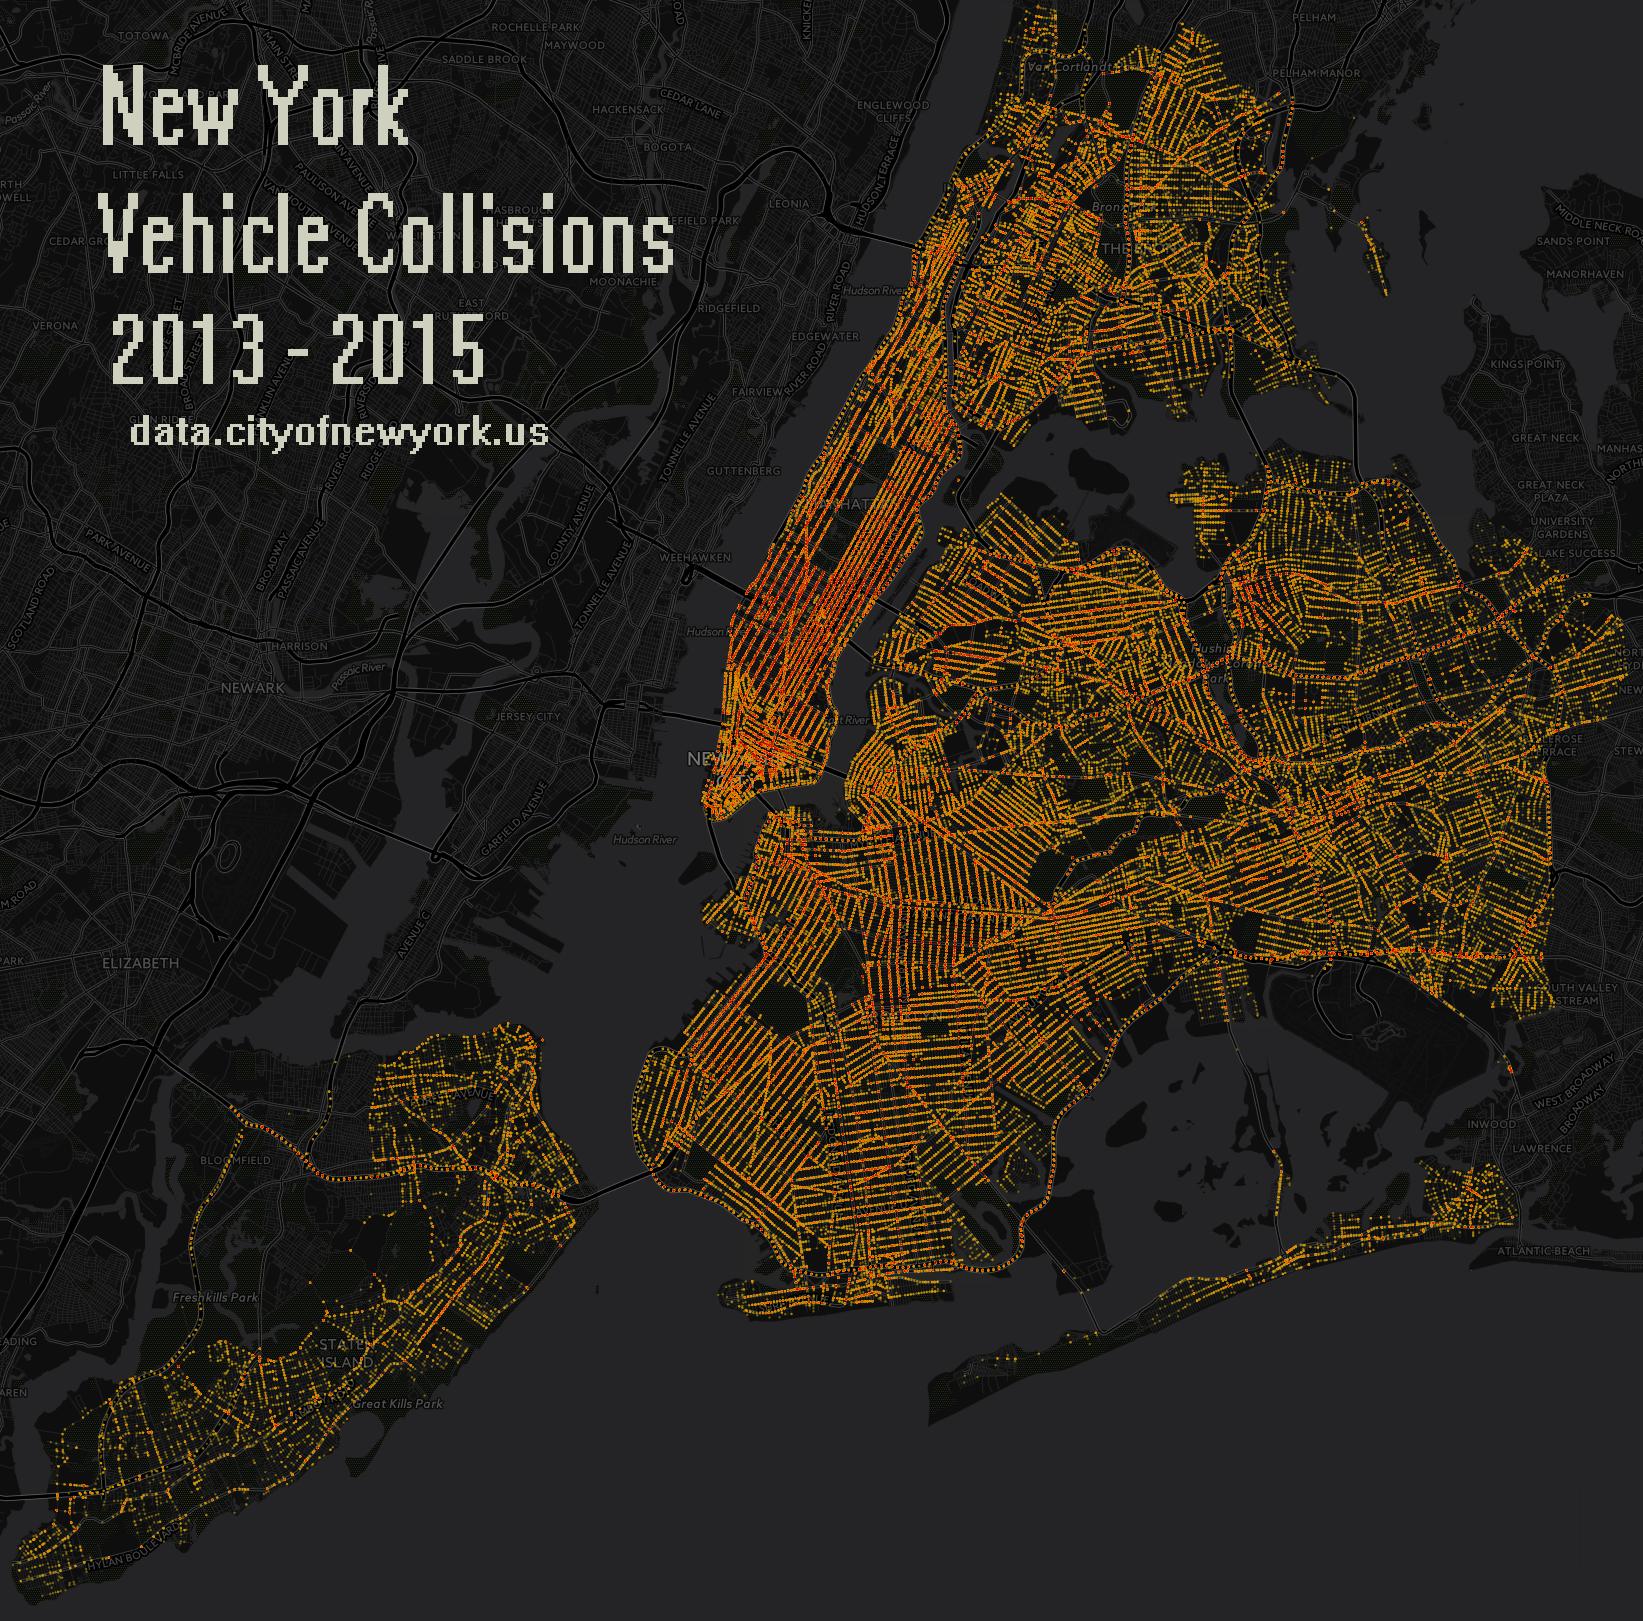 newyork2013-2015VehicleCollisions_Data_Intensity_Map